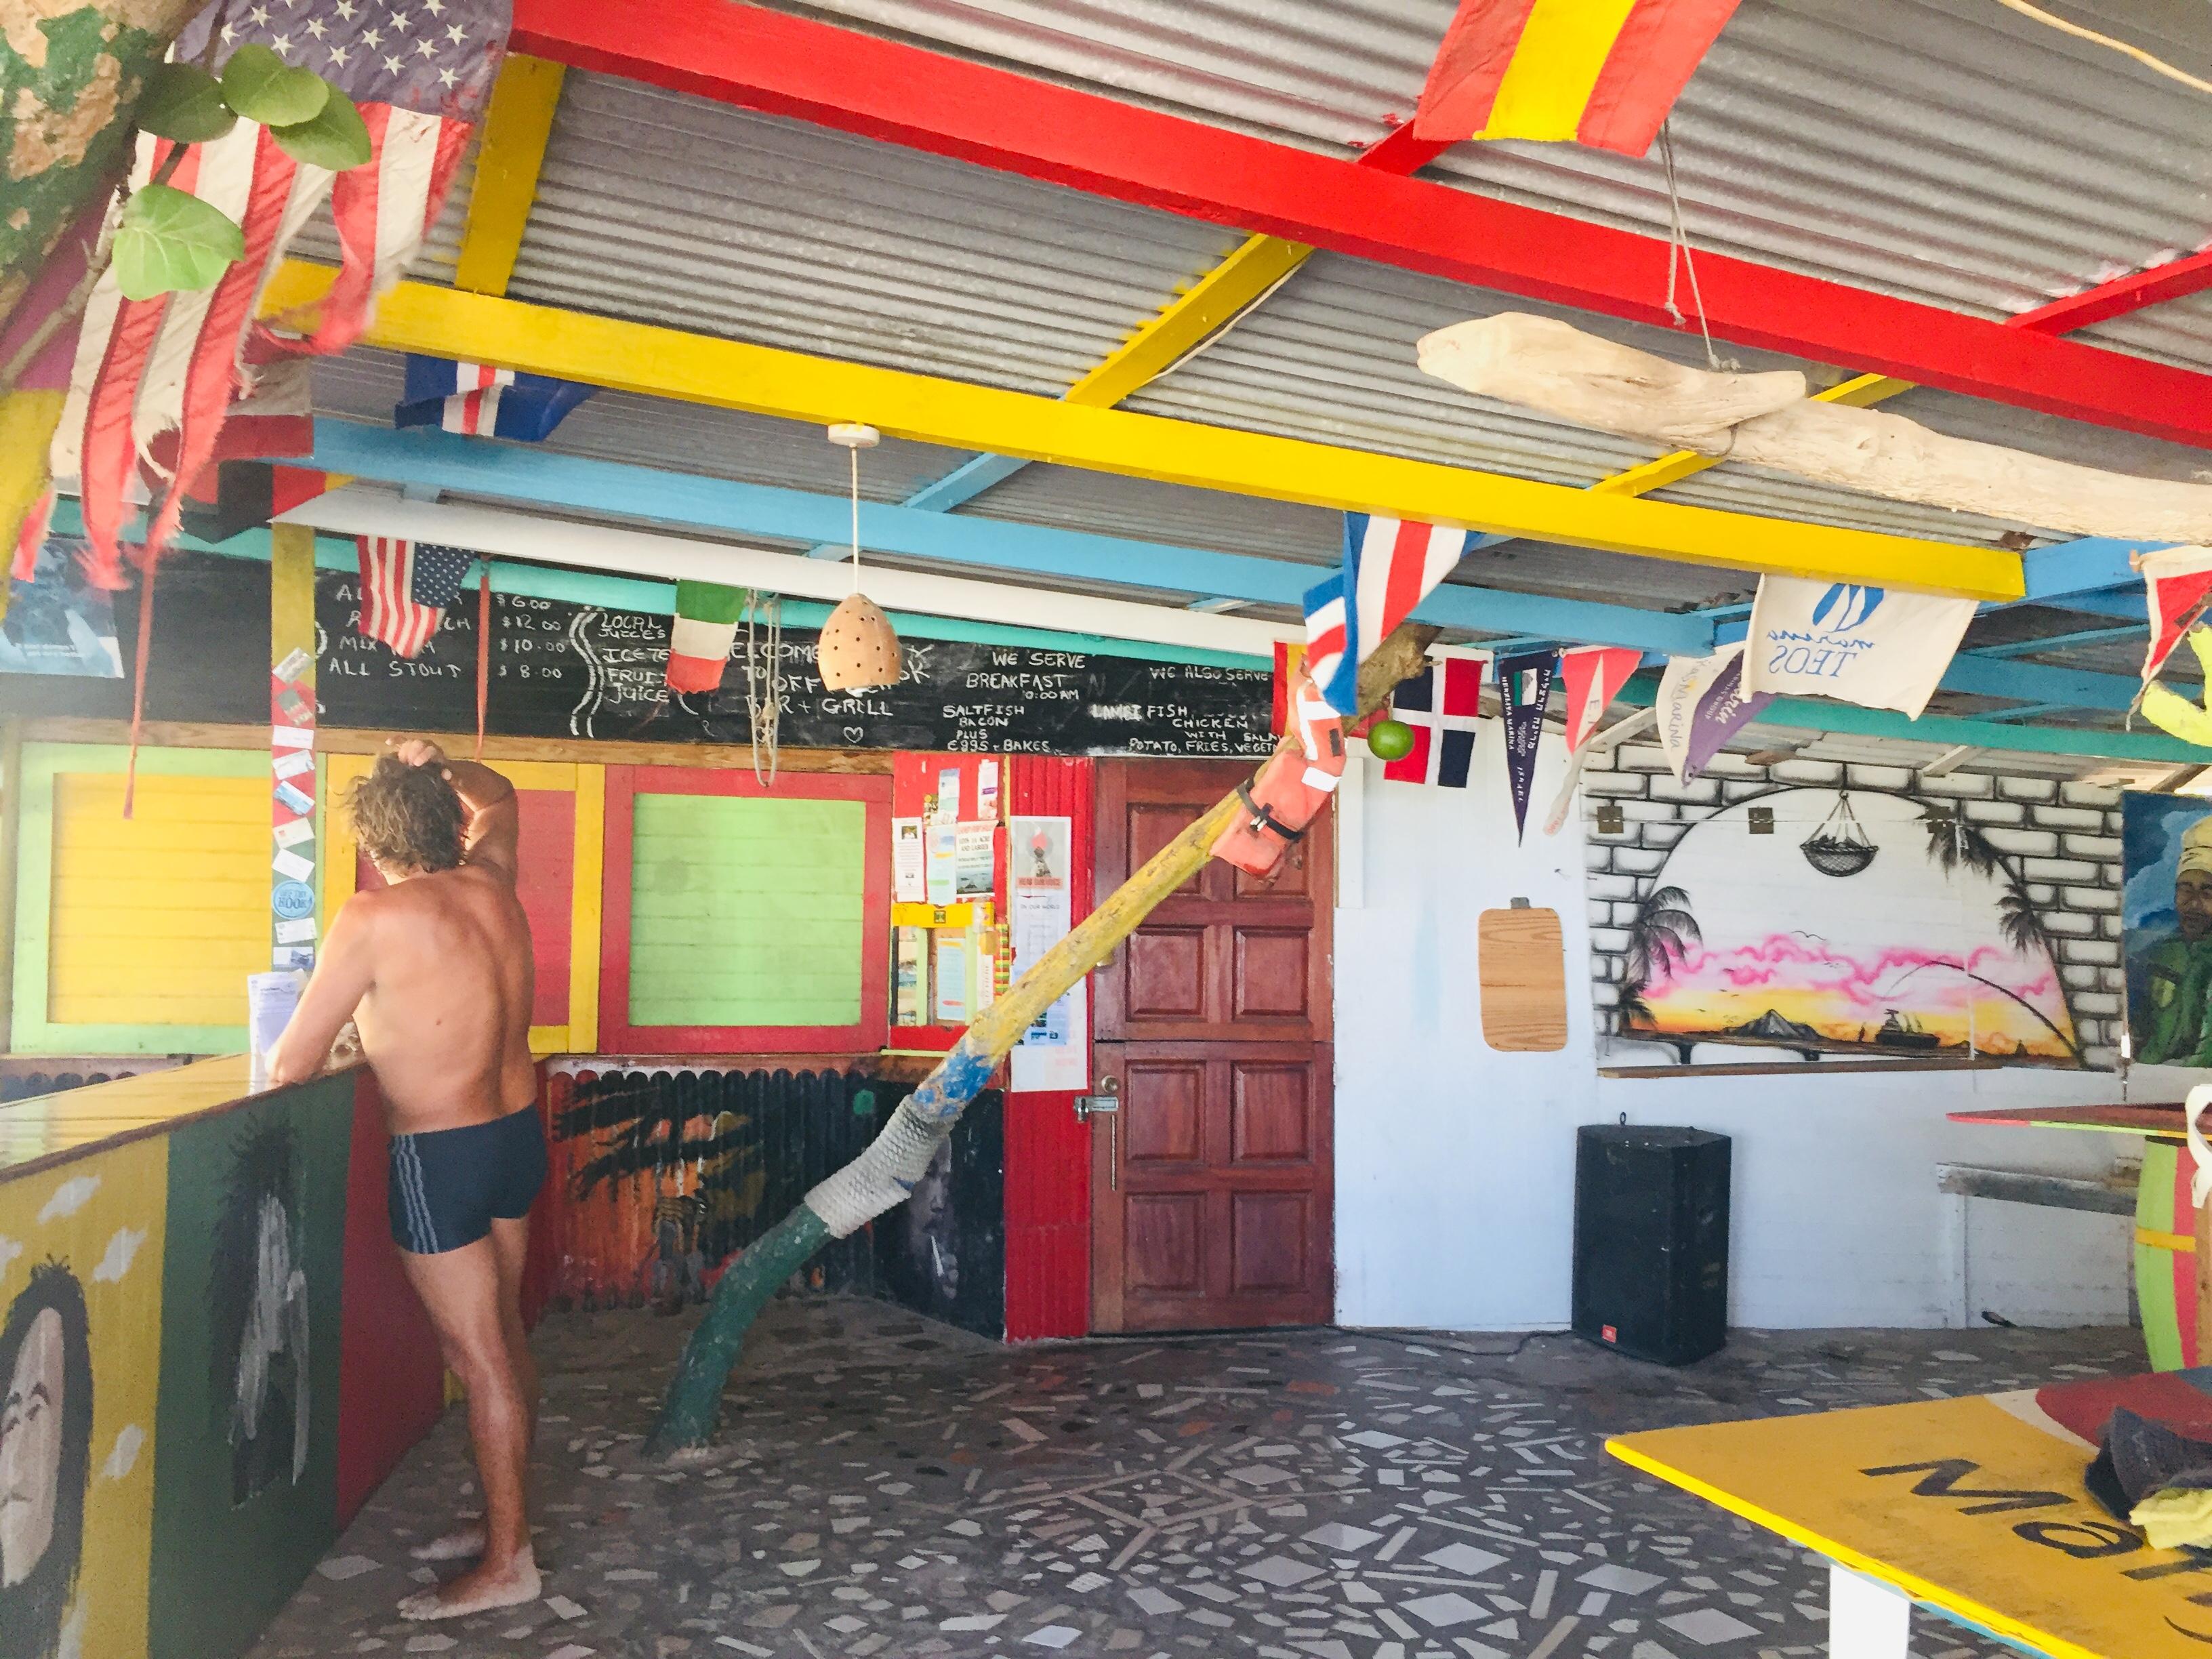 Barman - He's gone to Grenada!